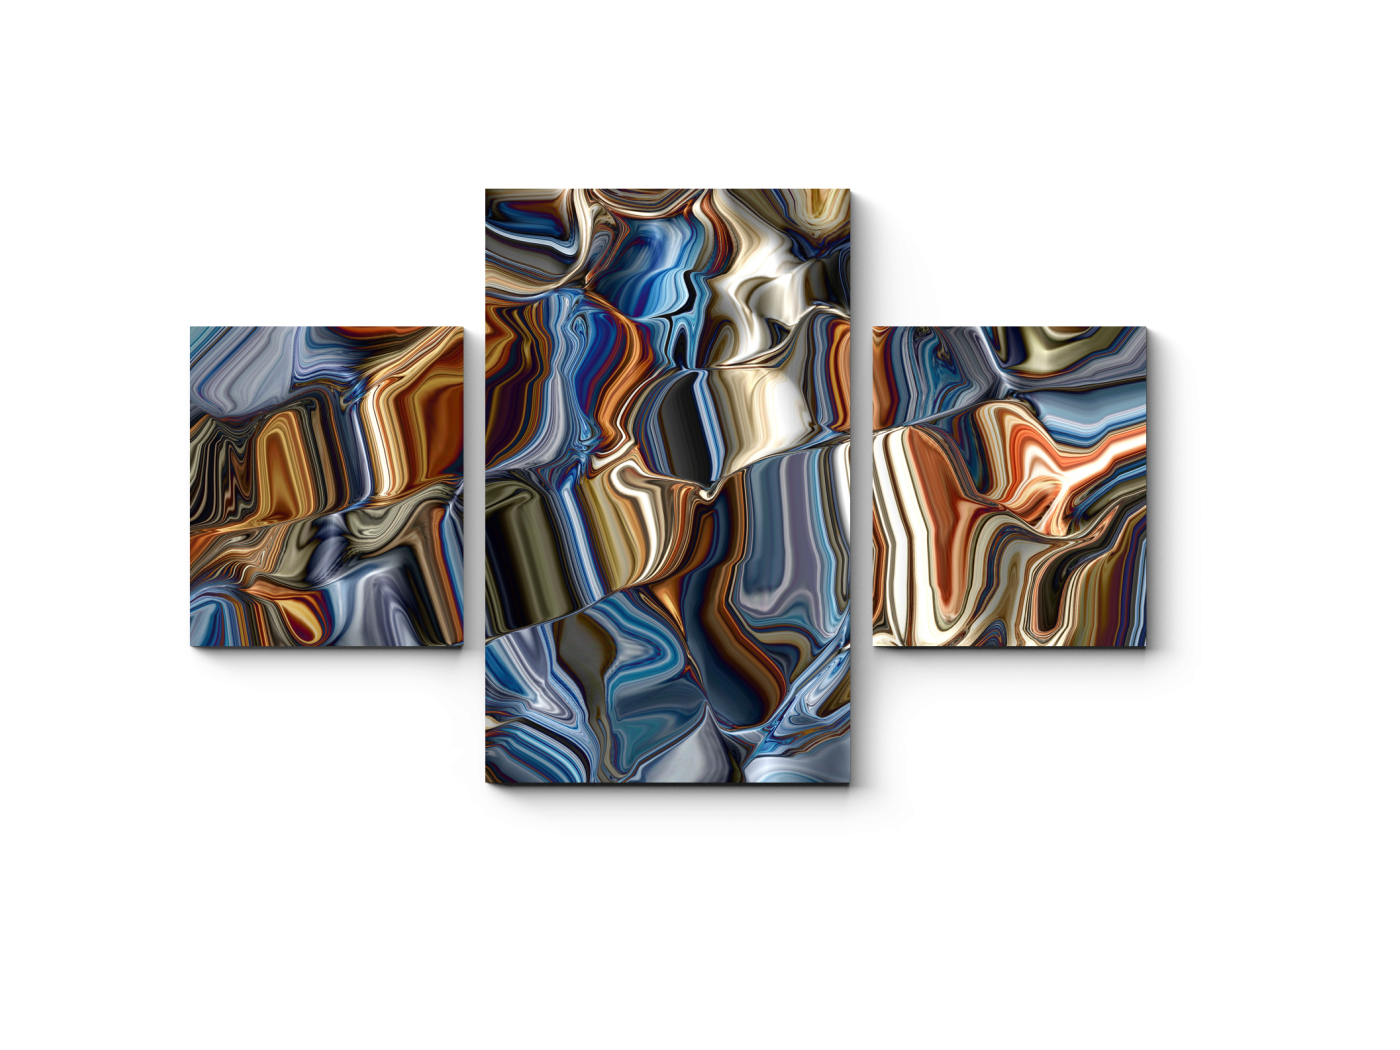 Модульная картина Цвета металла (80x52) фото